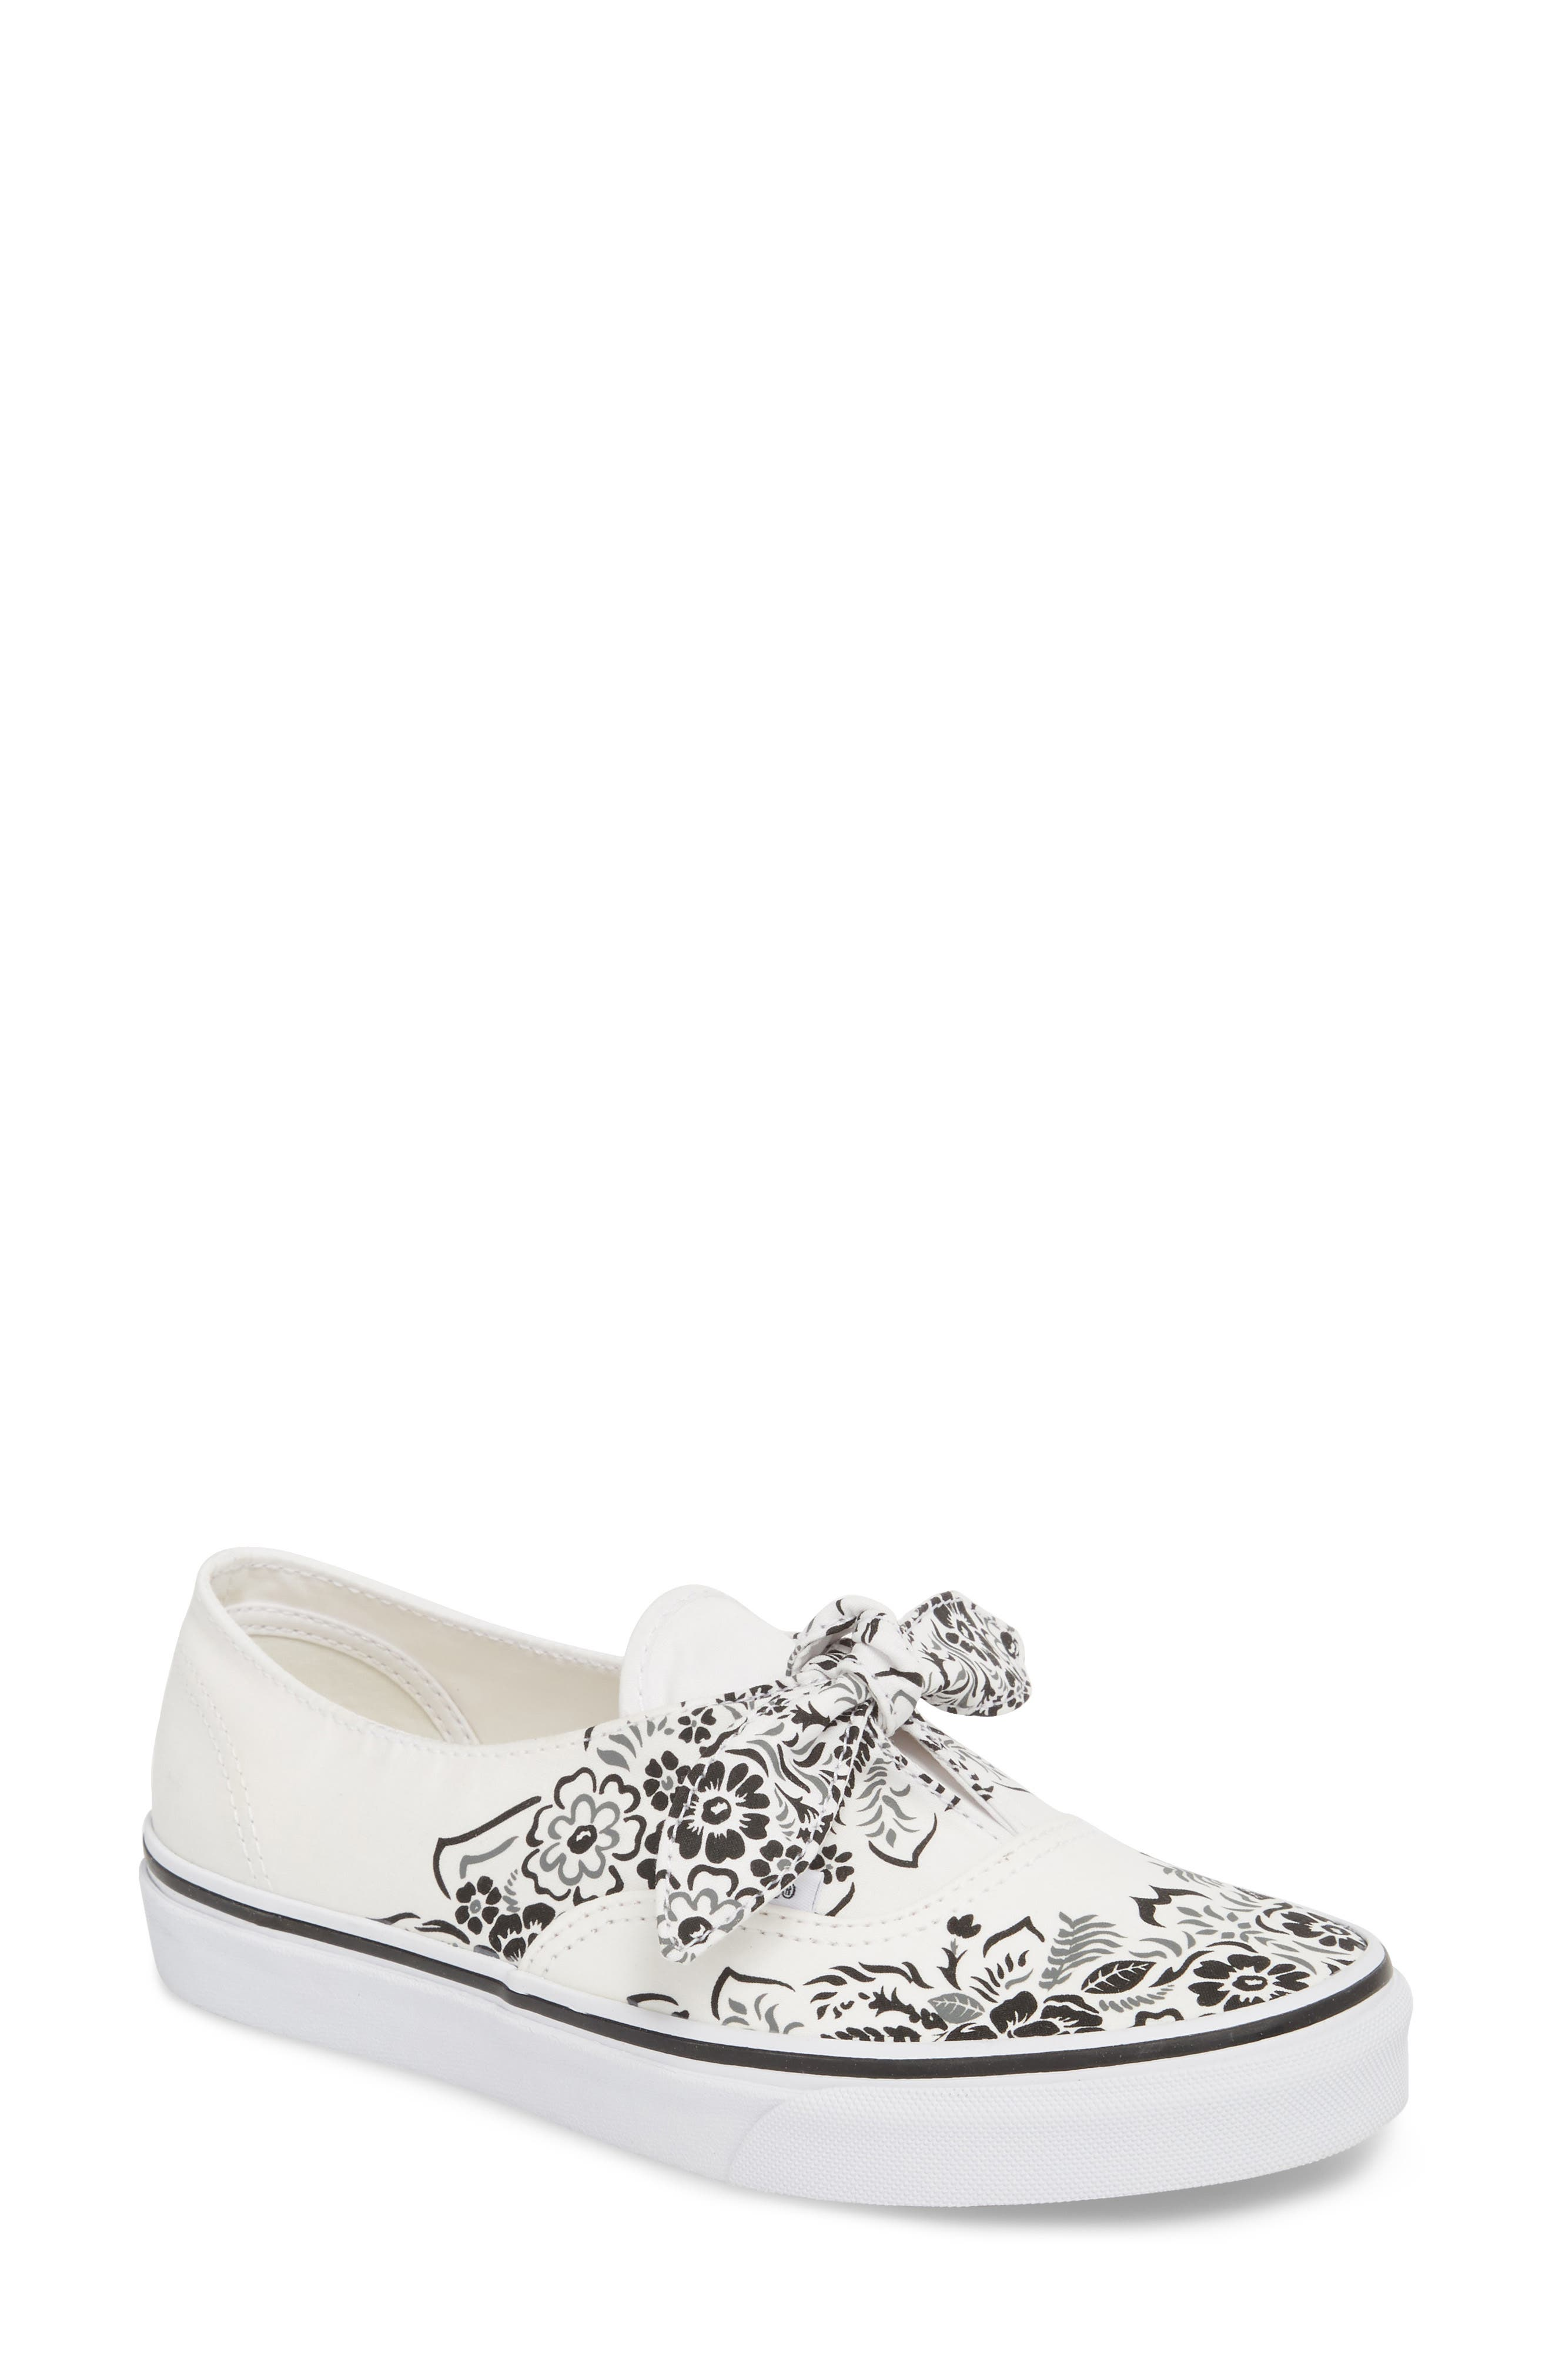 Vans Women's Ua Authentic Knotted Floral Bandana Slip-On Sneaker IYVfj4r